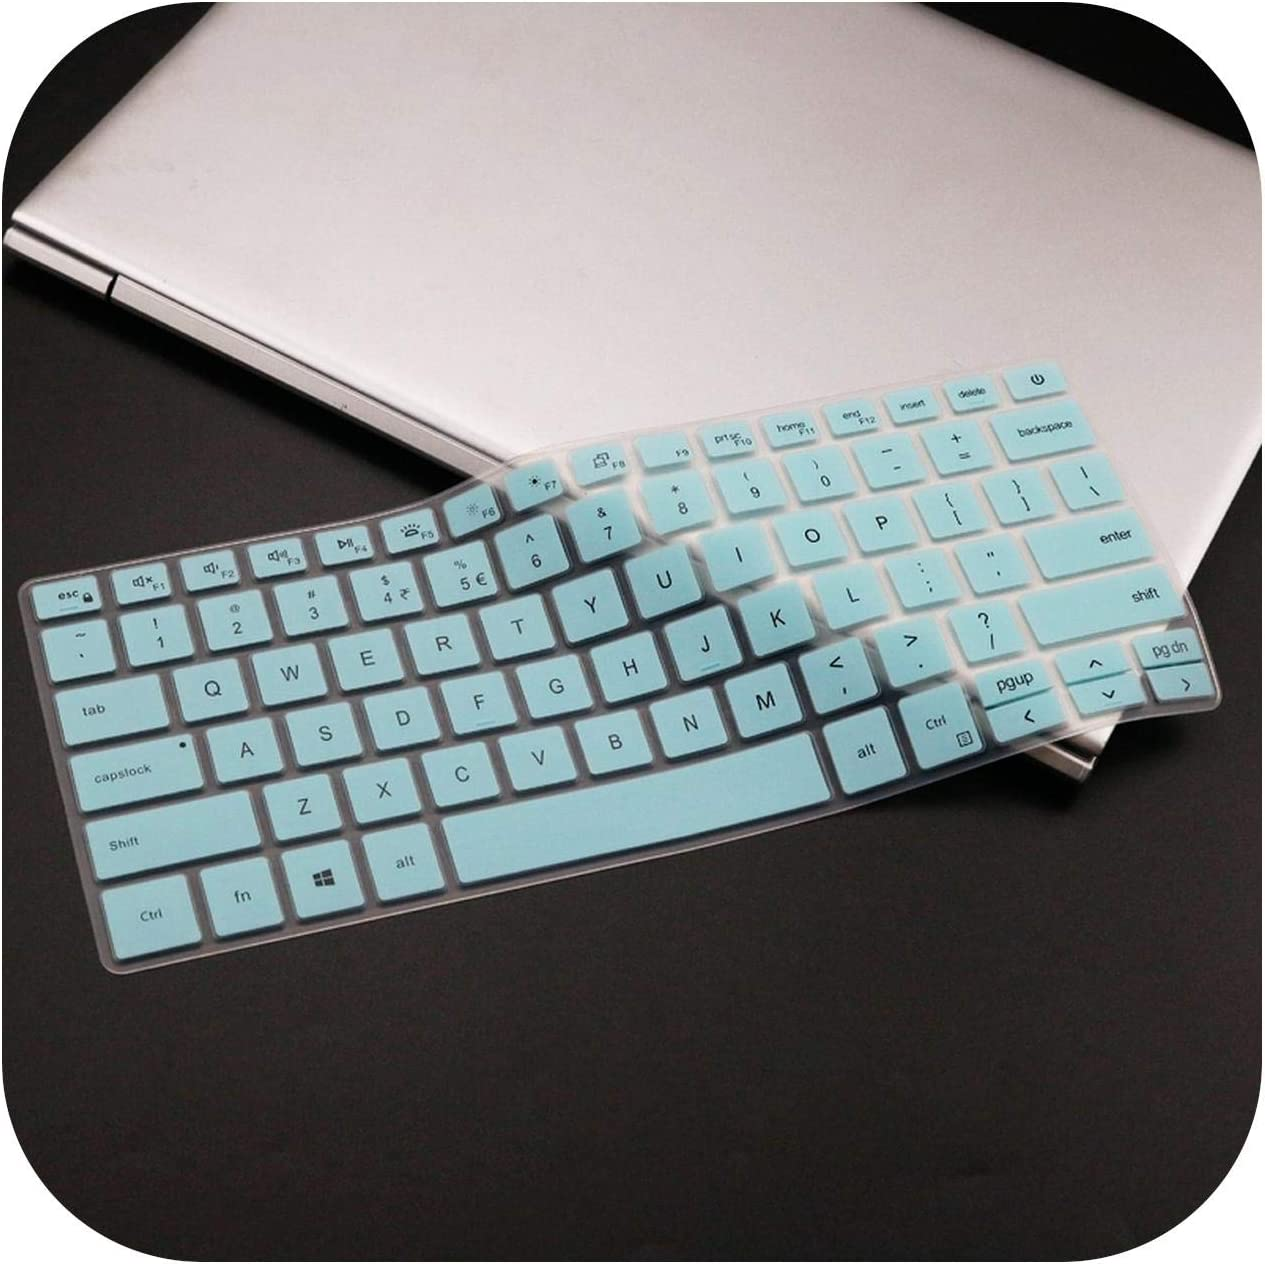 for Dell Inspiron 14 5493 5498 L Inspiron 5490 7490 7391 5498 5493 L Inspiron 7490 Silicone Laptop Keyboard Cover Skin Clear